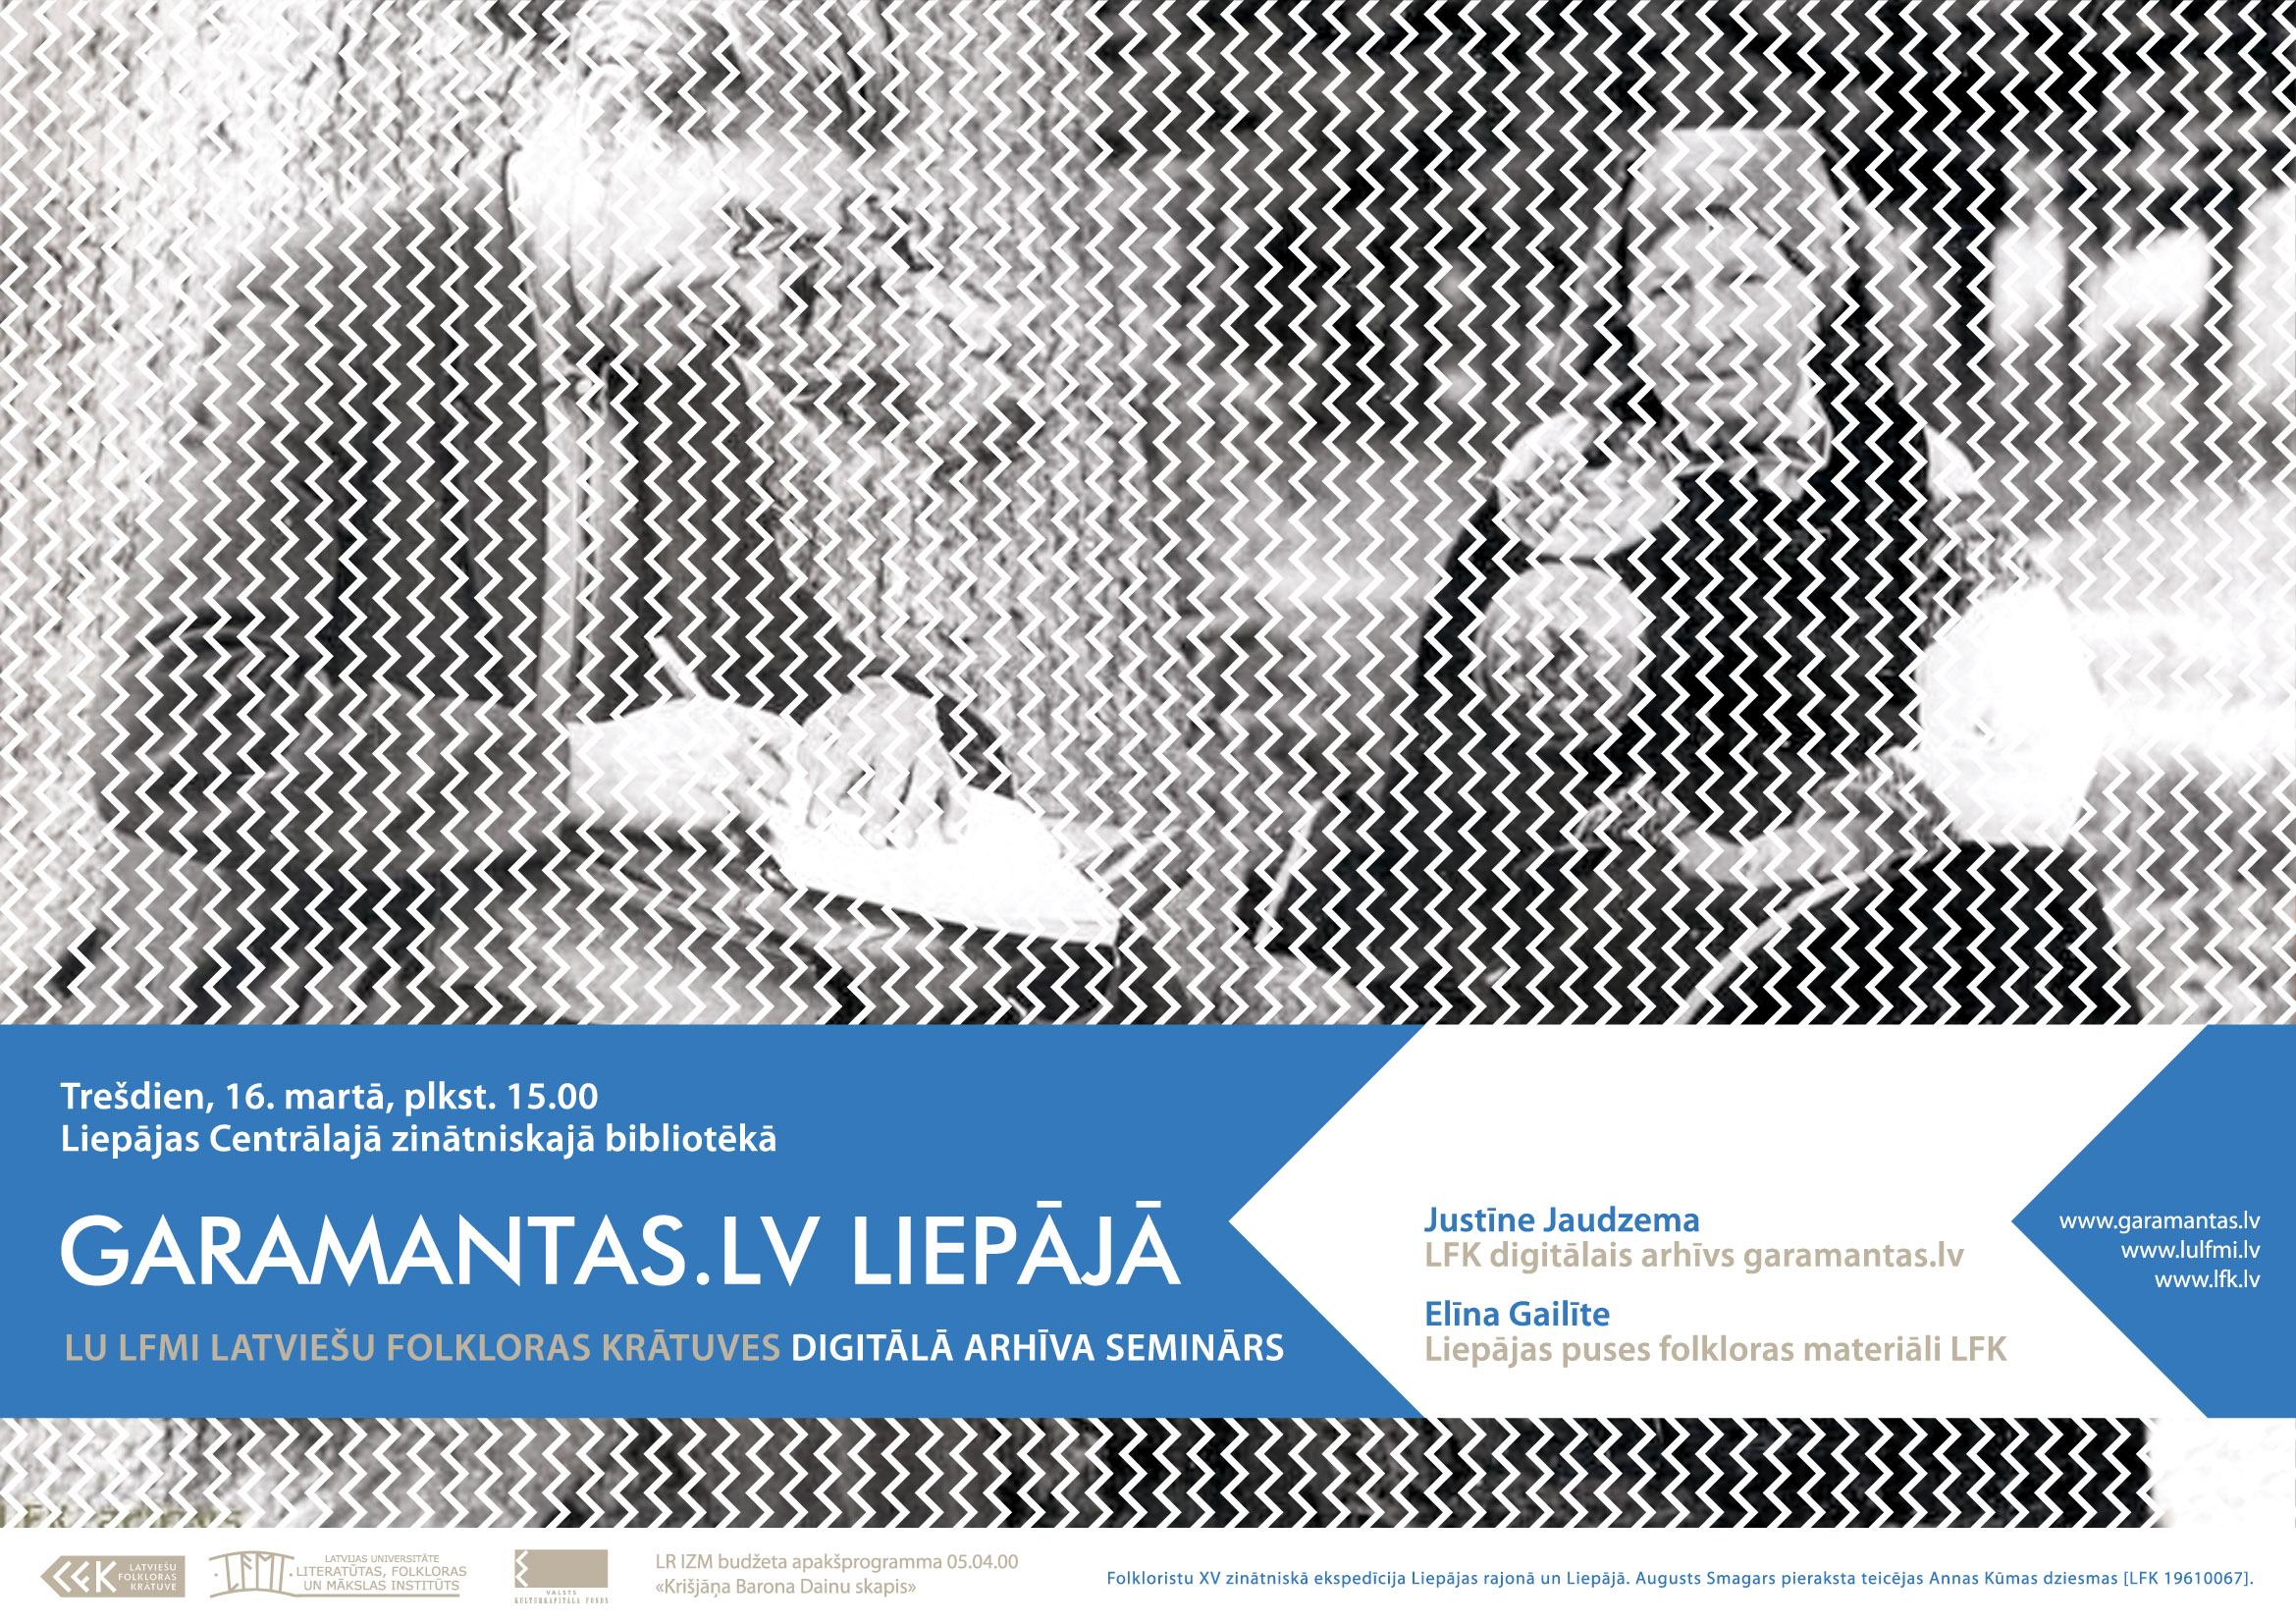 LFK_seminars_Liepaja-56dfe9cc54c5e.jpg